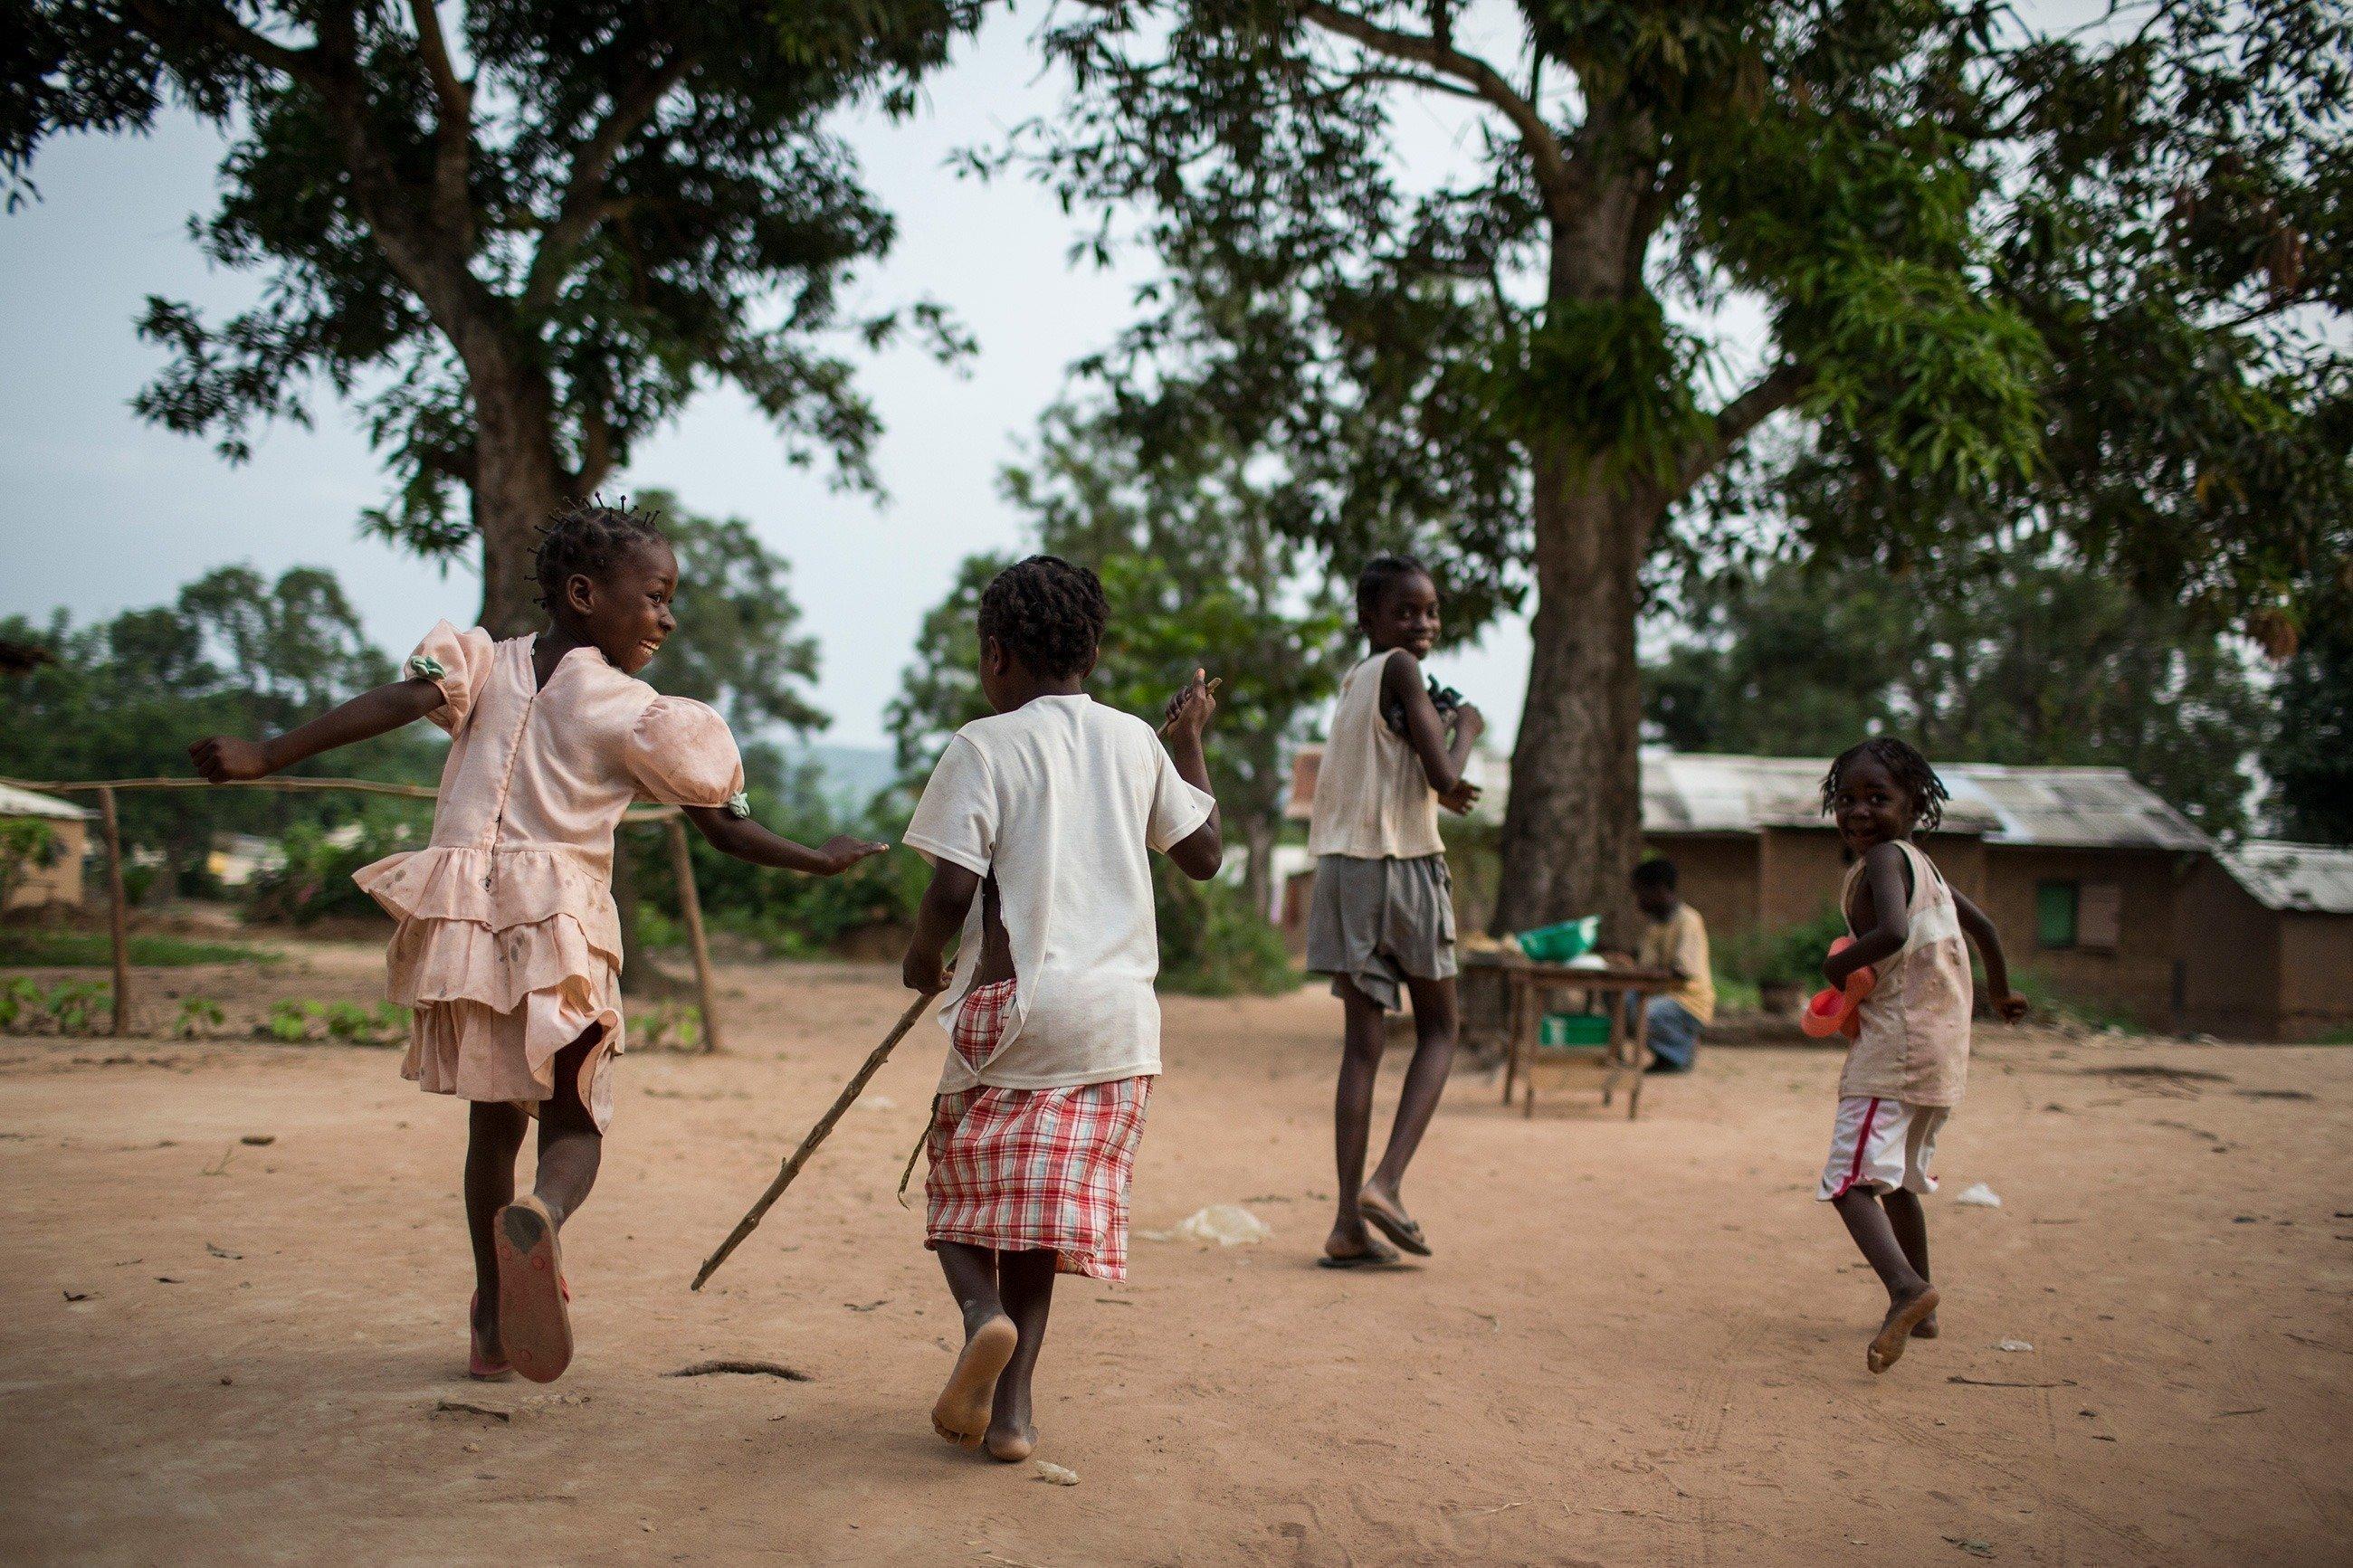 Afrikanische Kinder spielen fangen.